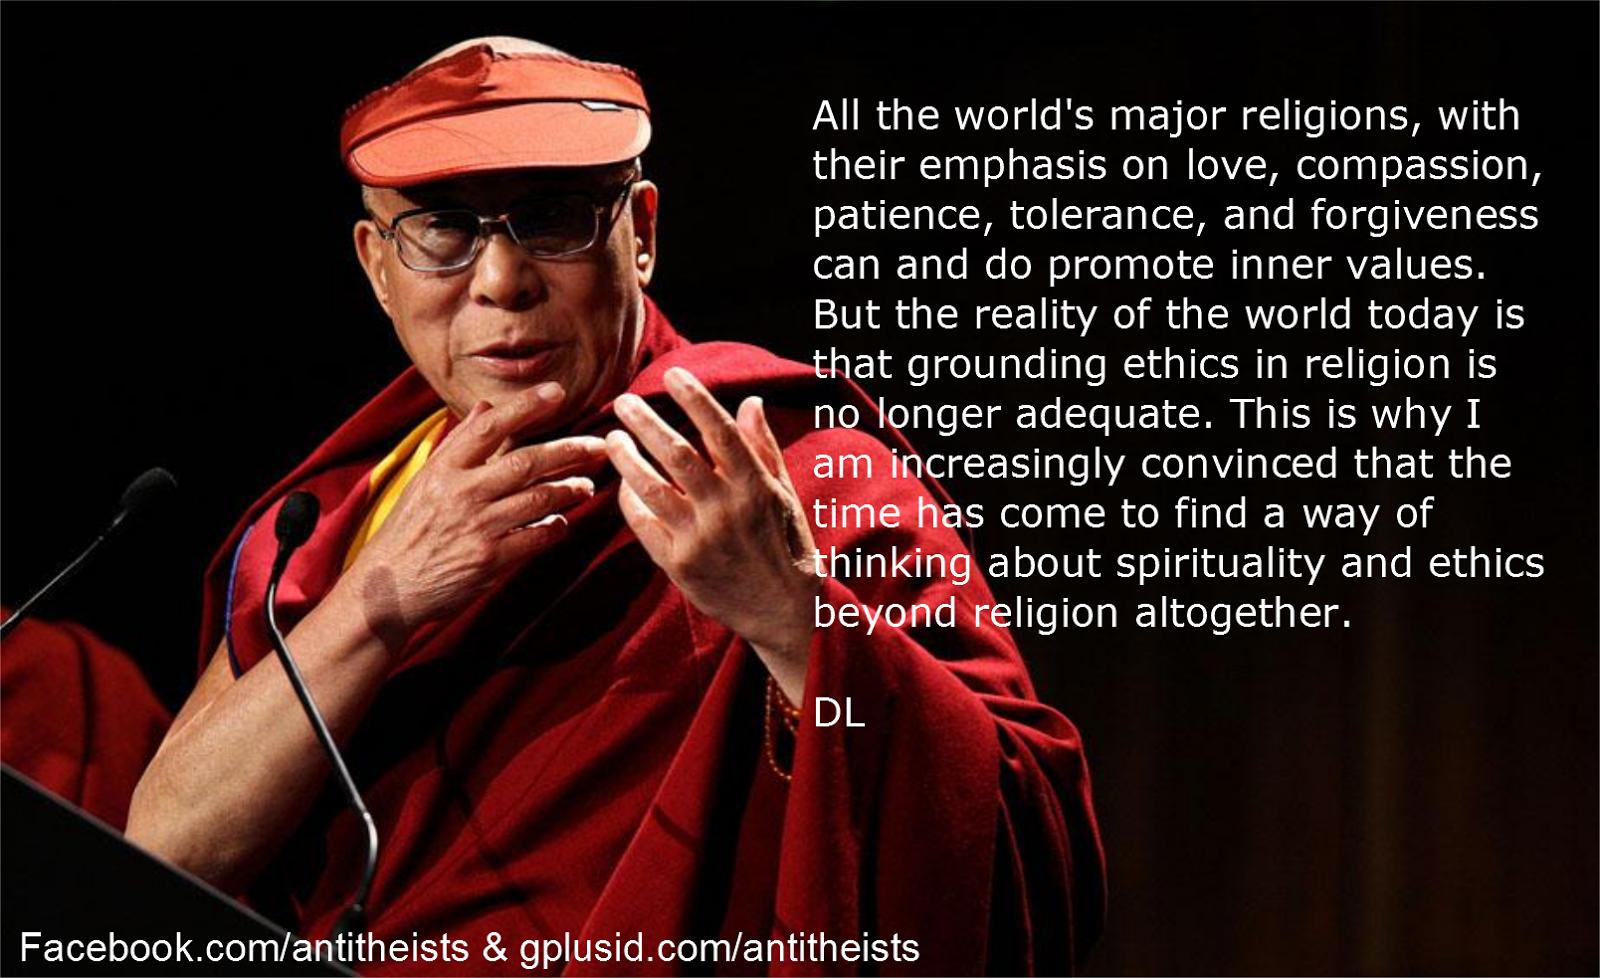 Dalai Lama quote #1